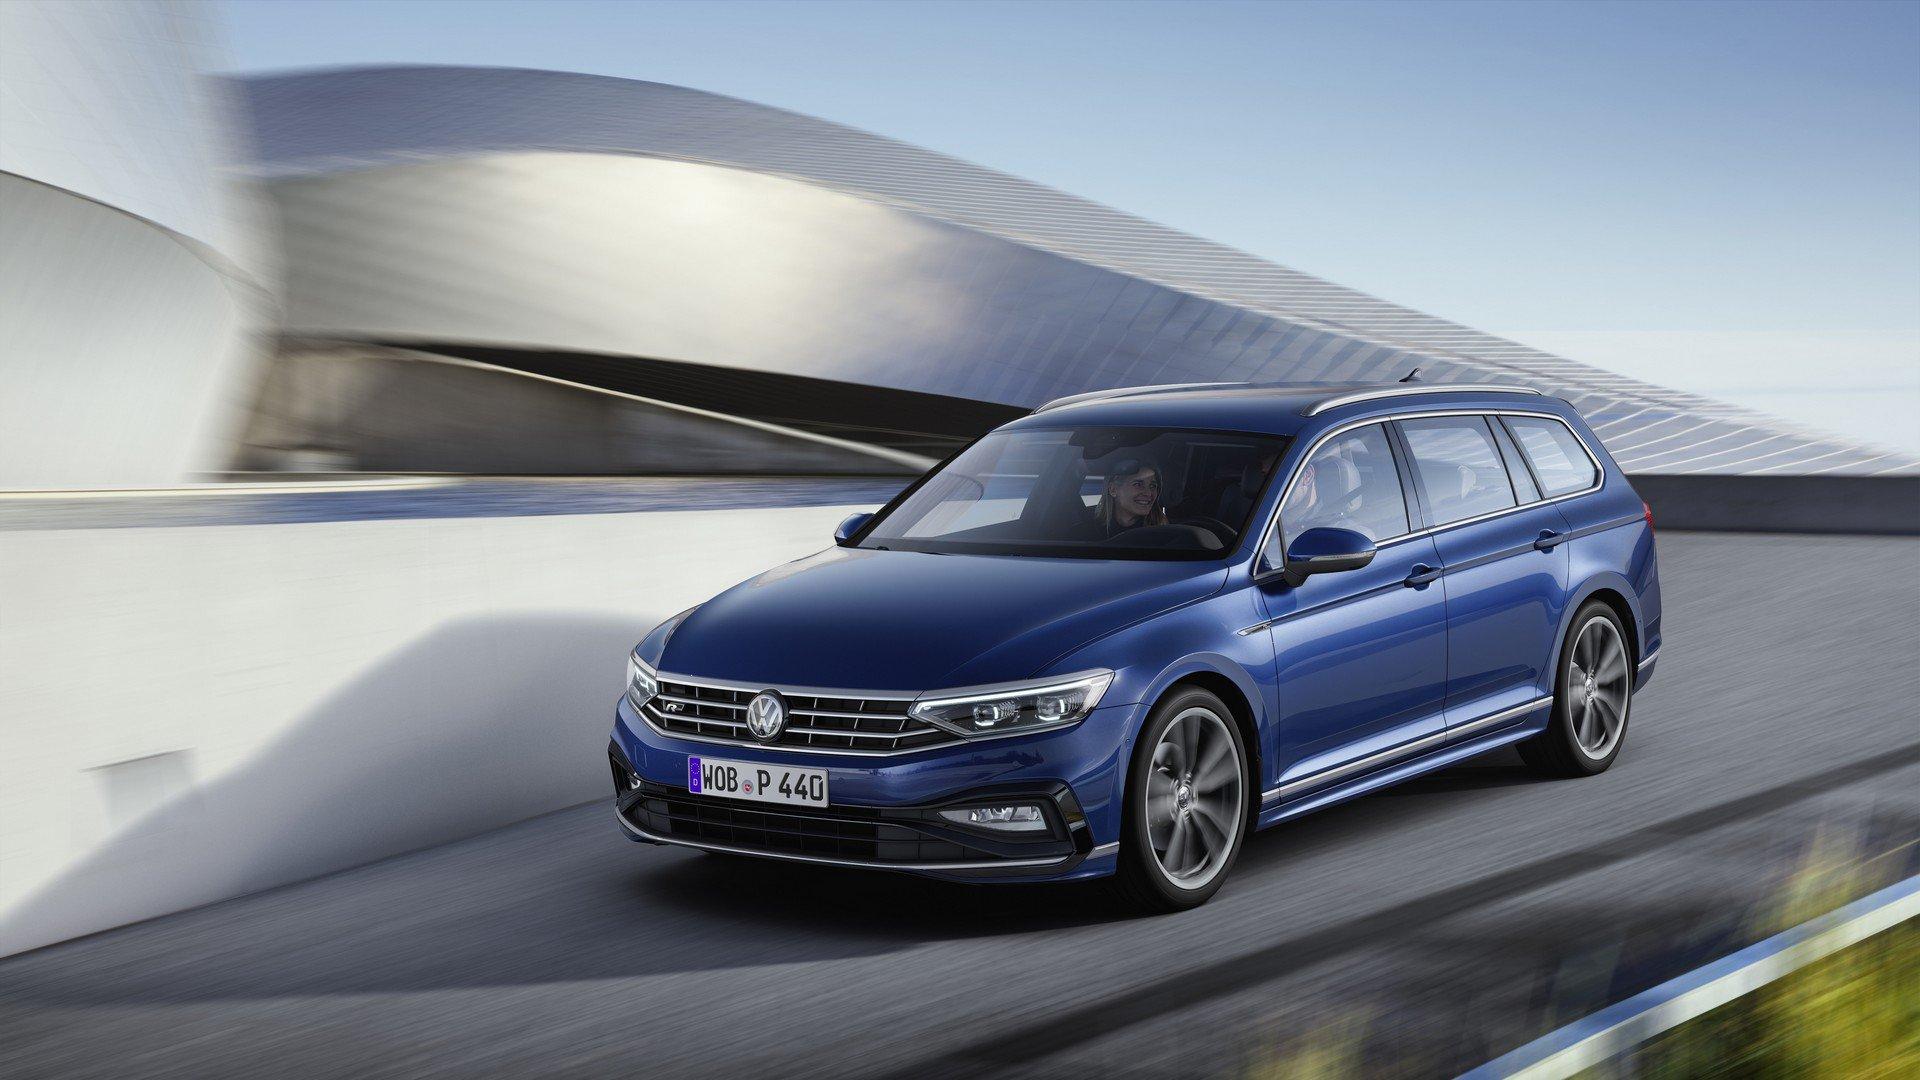 VW「パサート」がマイナーチェンジ!改良型に見られる変更点とは?